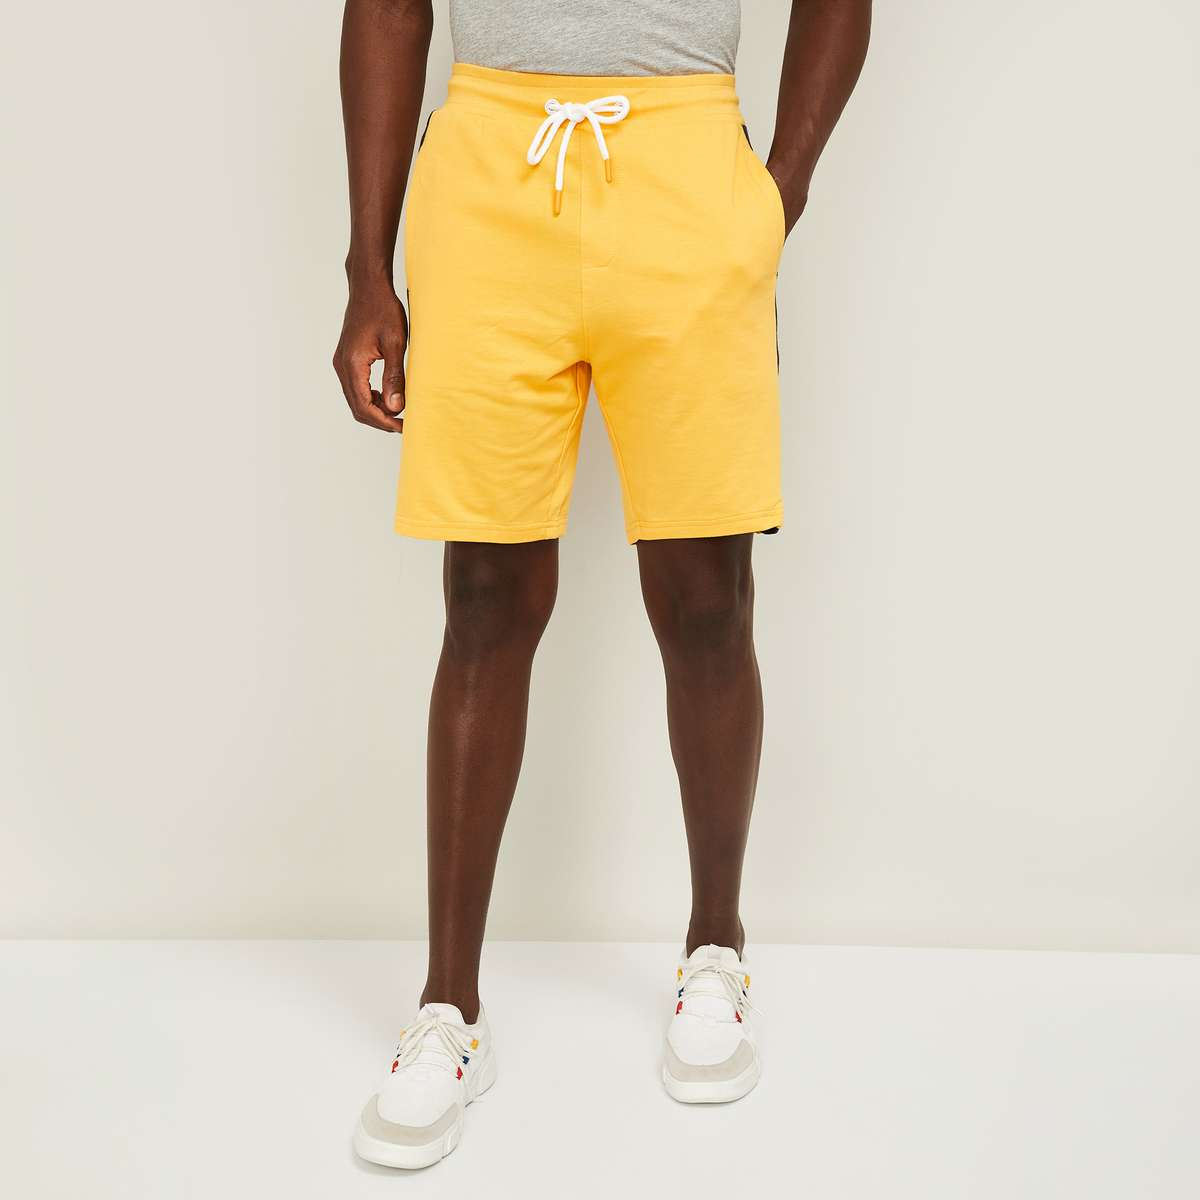 4.UCLA Men Printed Casual Shorts